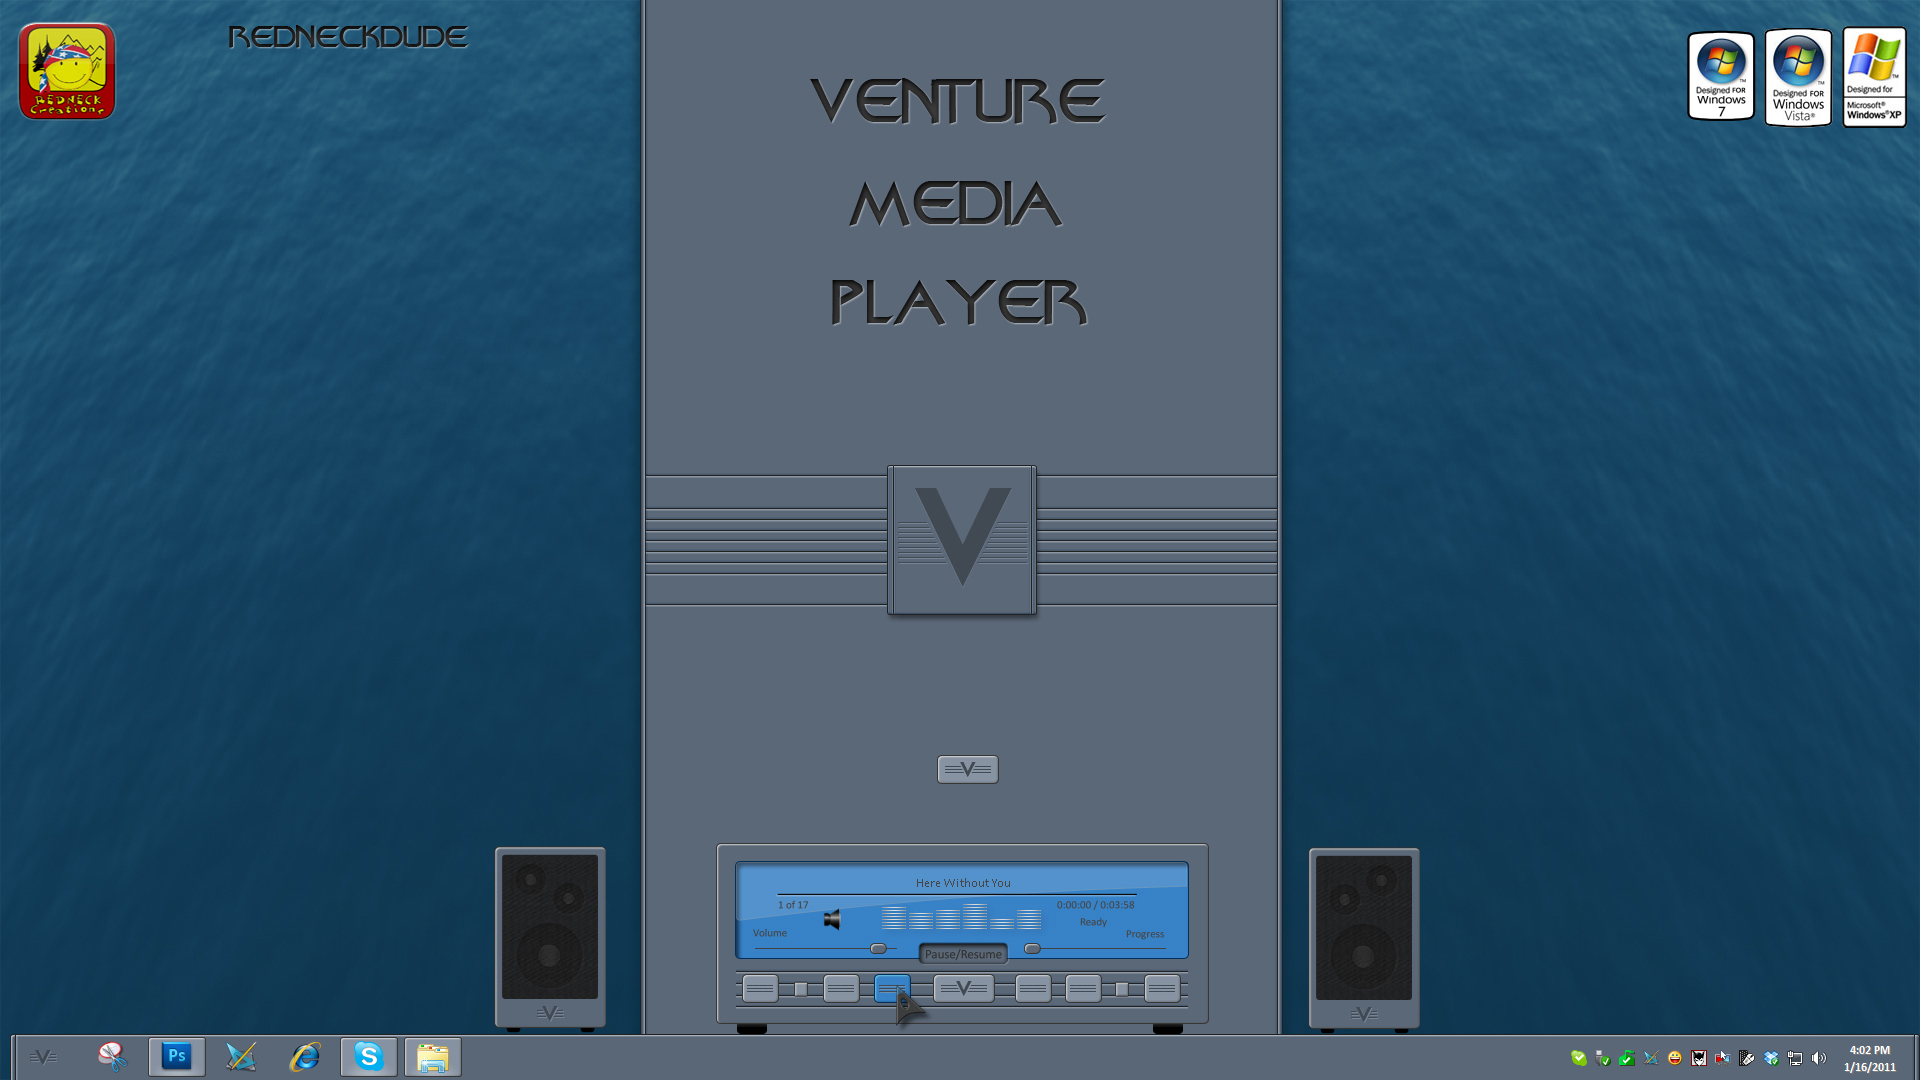 Venture Media Gadget